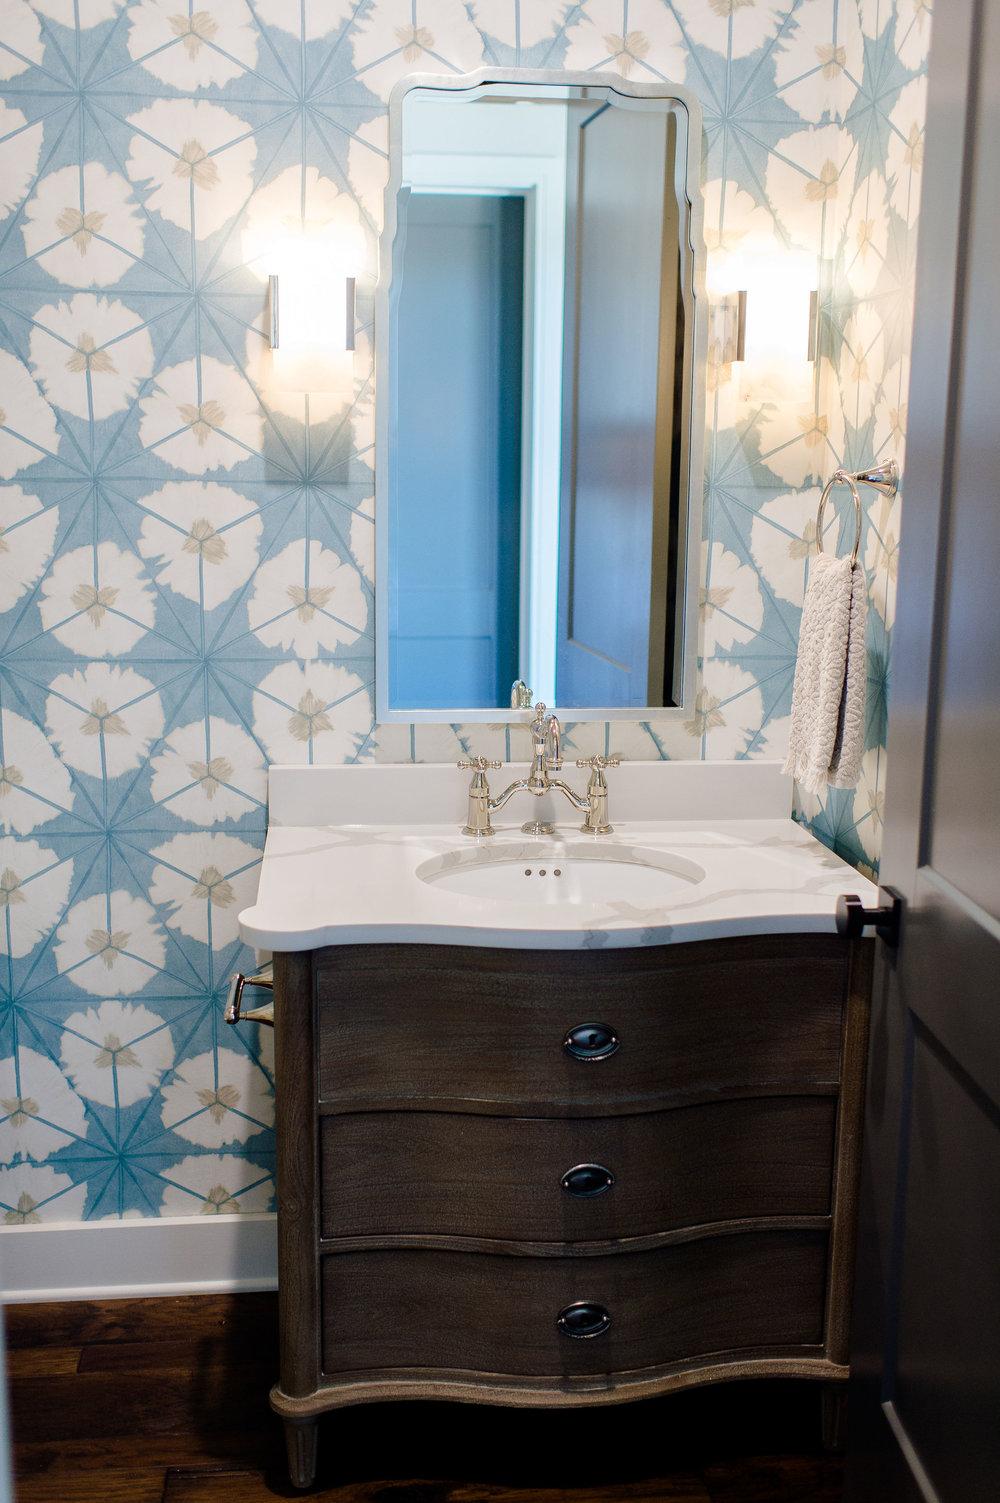 Hill-Country-Transitional-Clark-Design-Studio-Renovation-Wichita-Falls-Texas-Interior-Design-Remodeling-thibaut-wallpaper.jpg